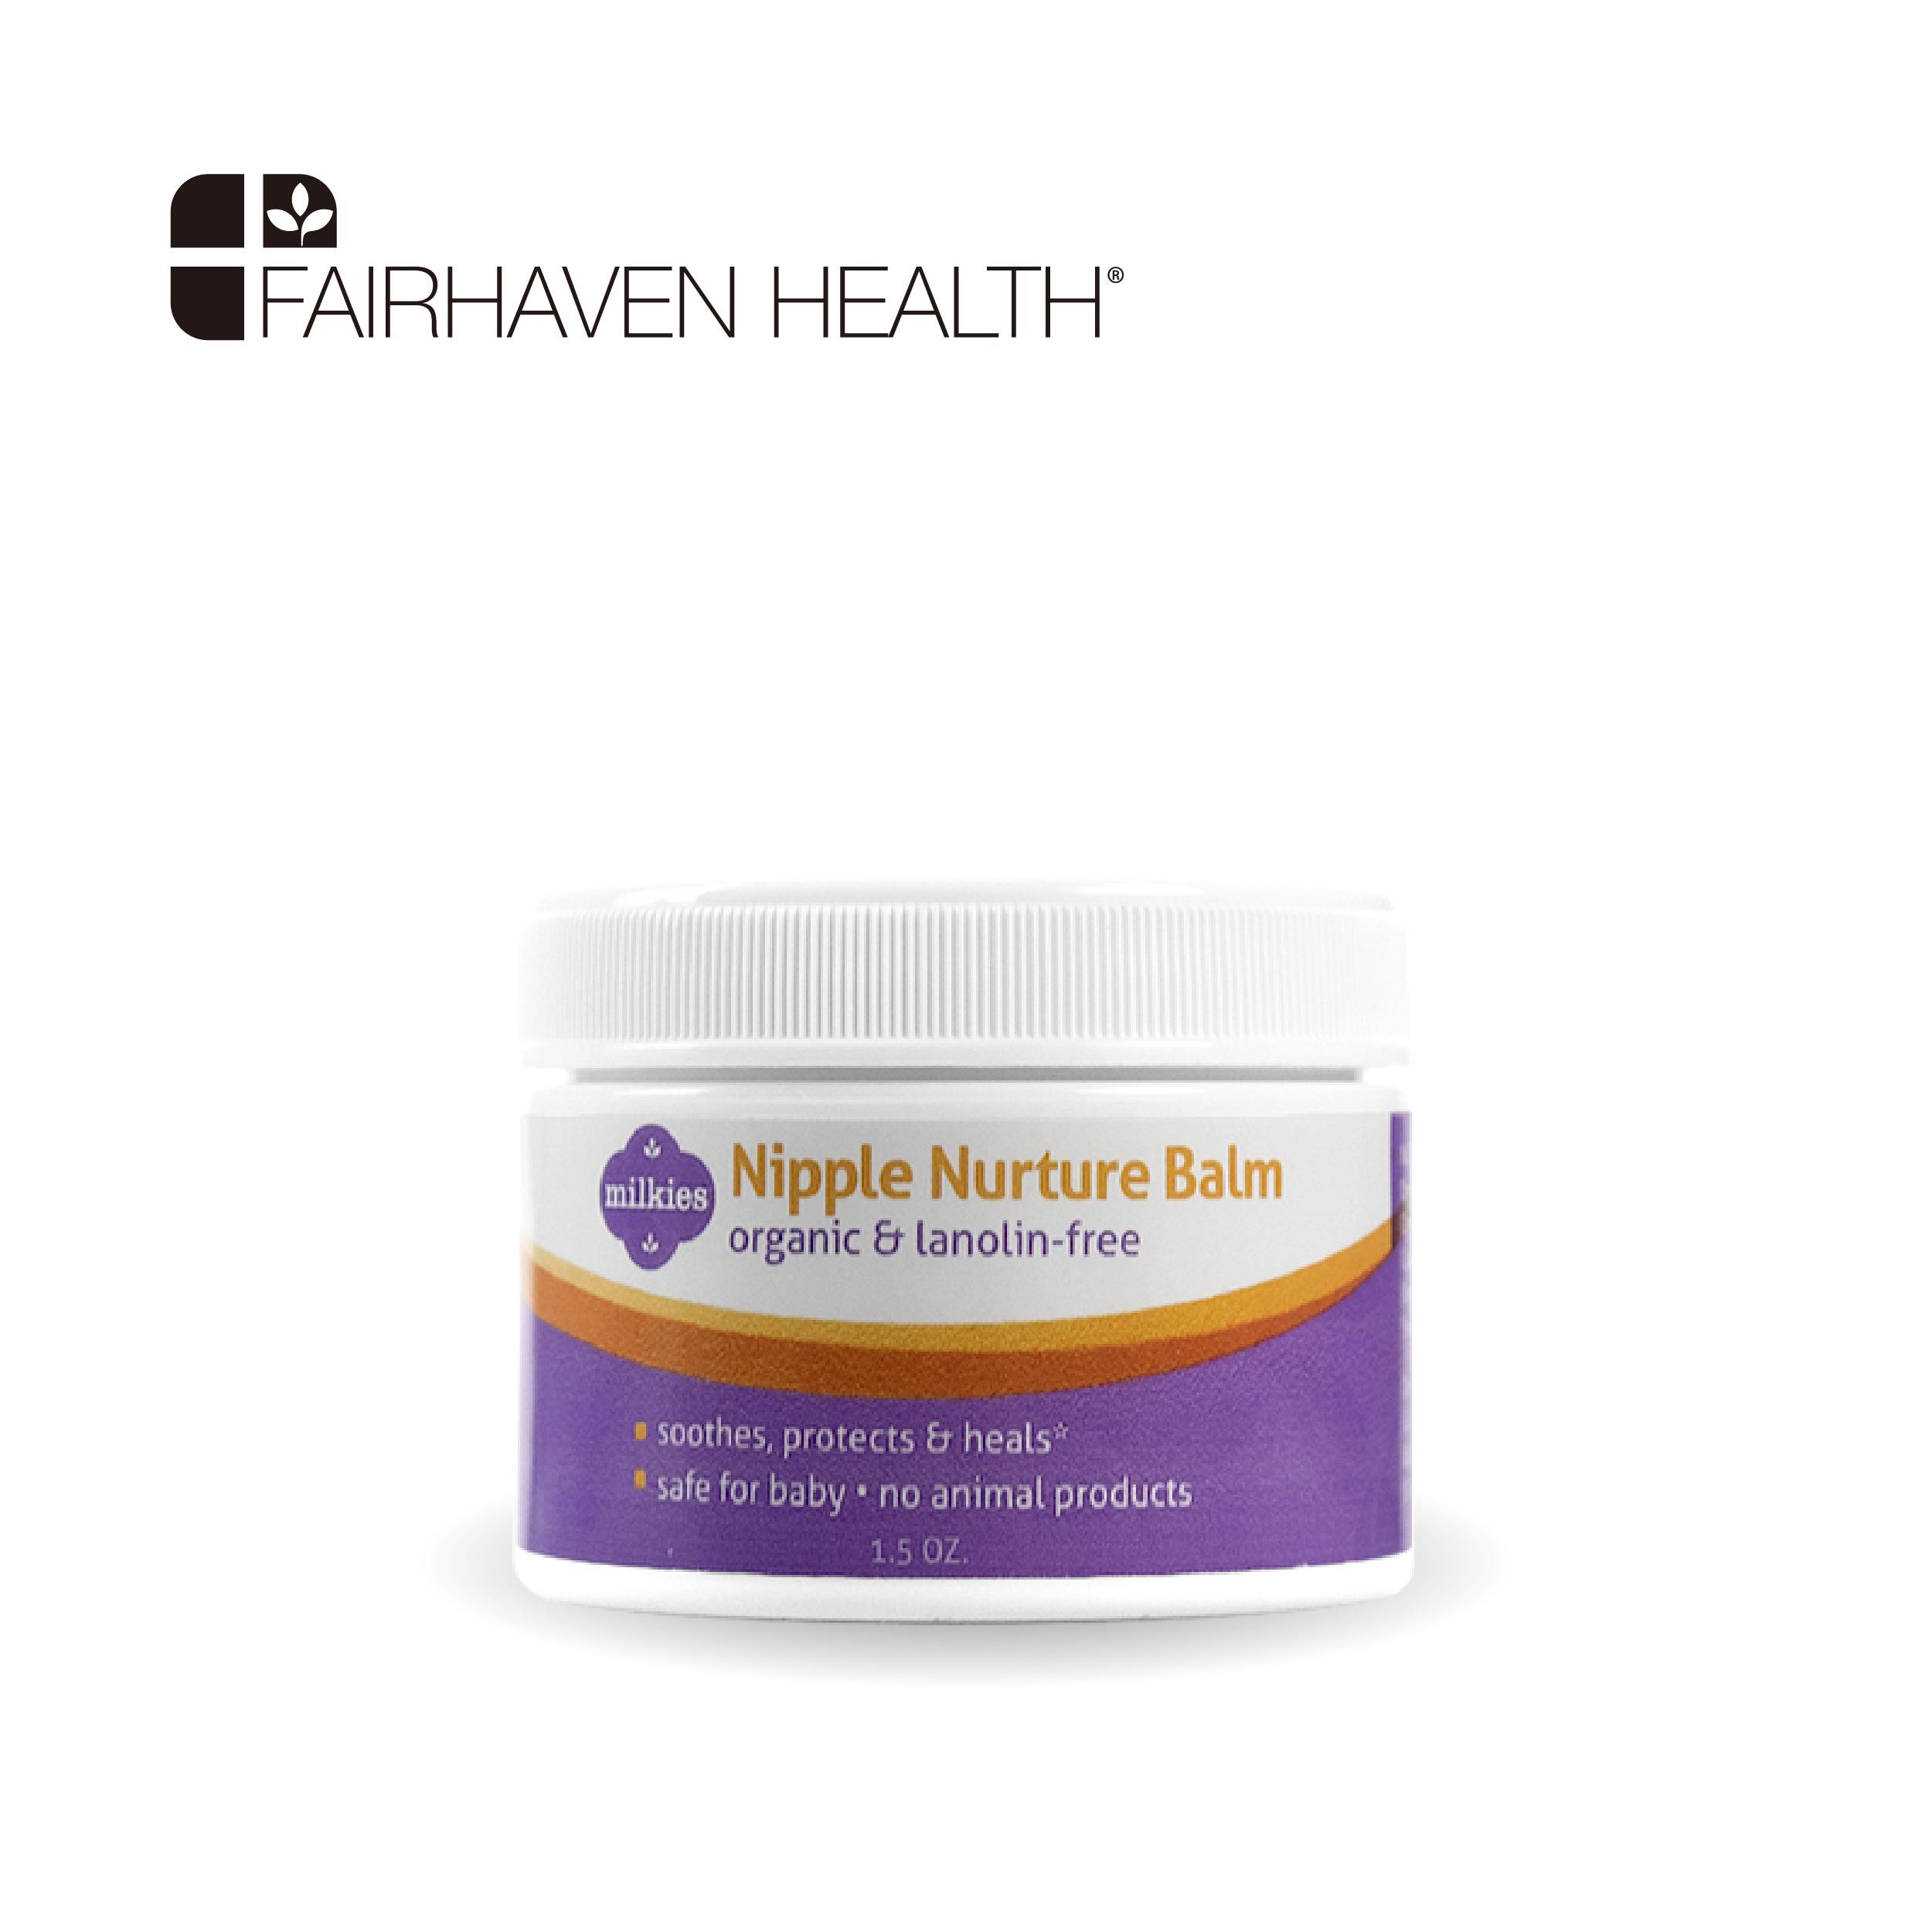 Fairhaven Health 乳頭滋潤霜 1.5oz